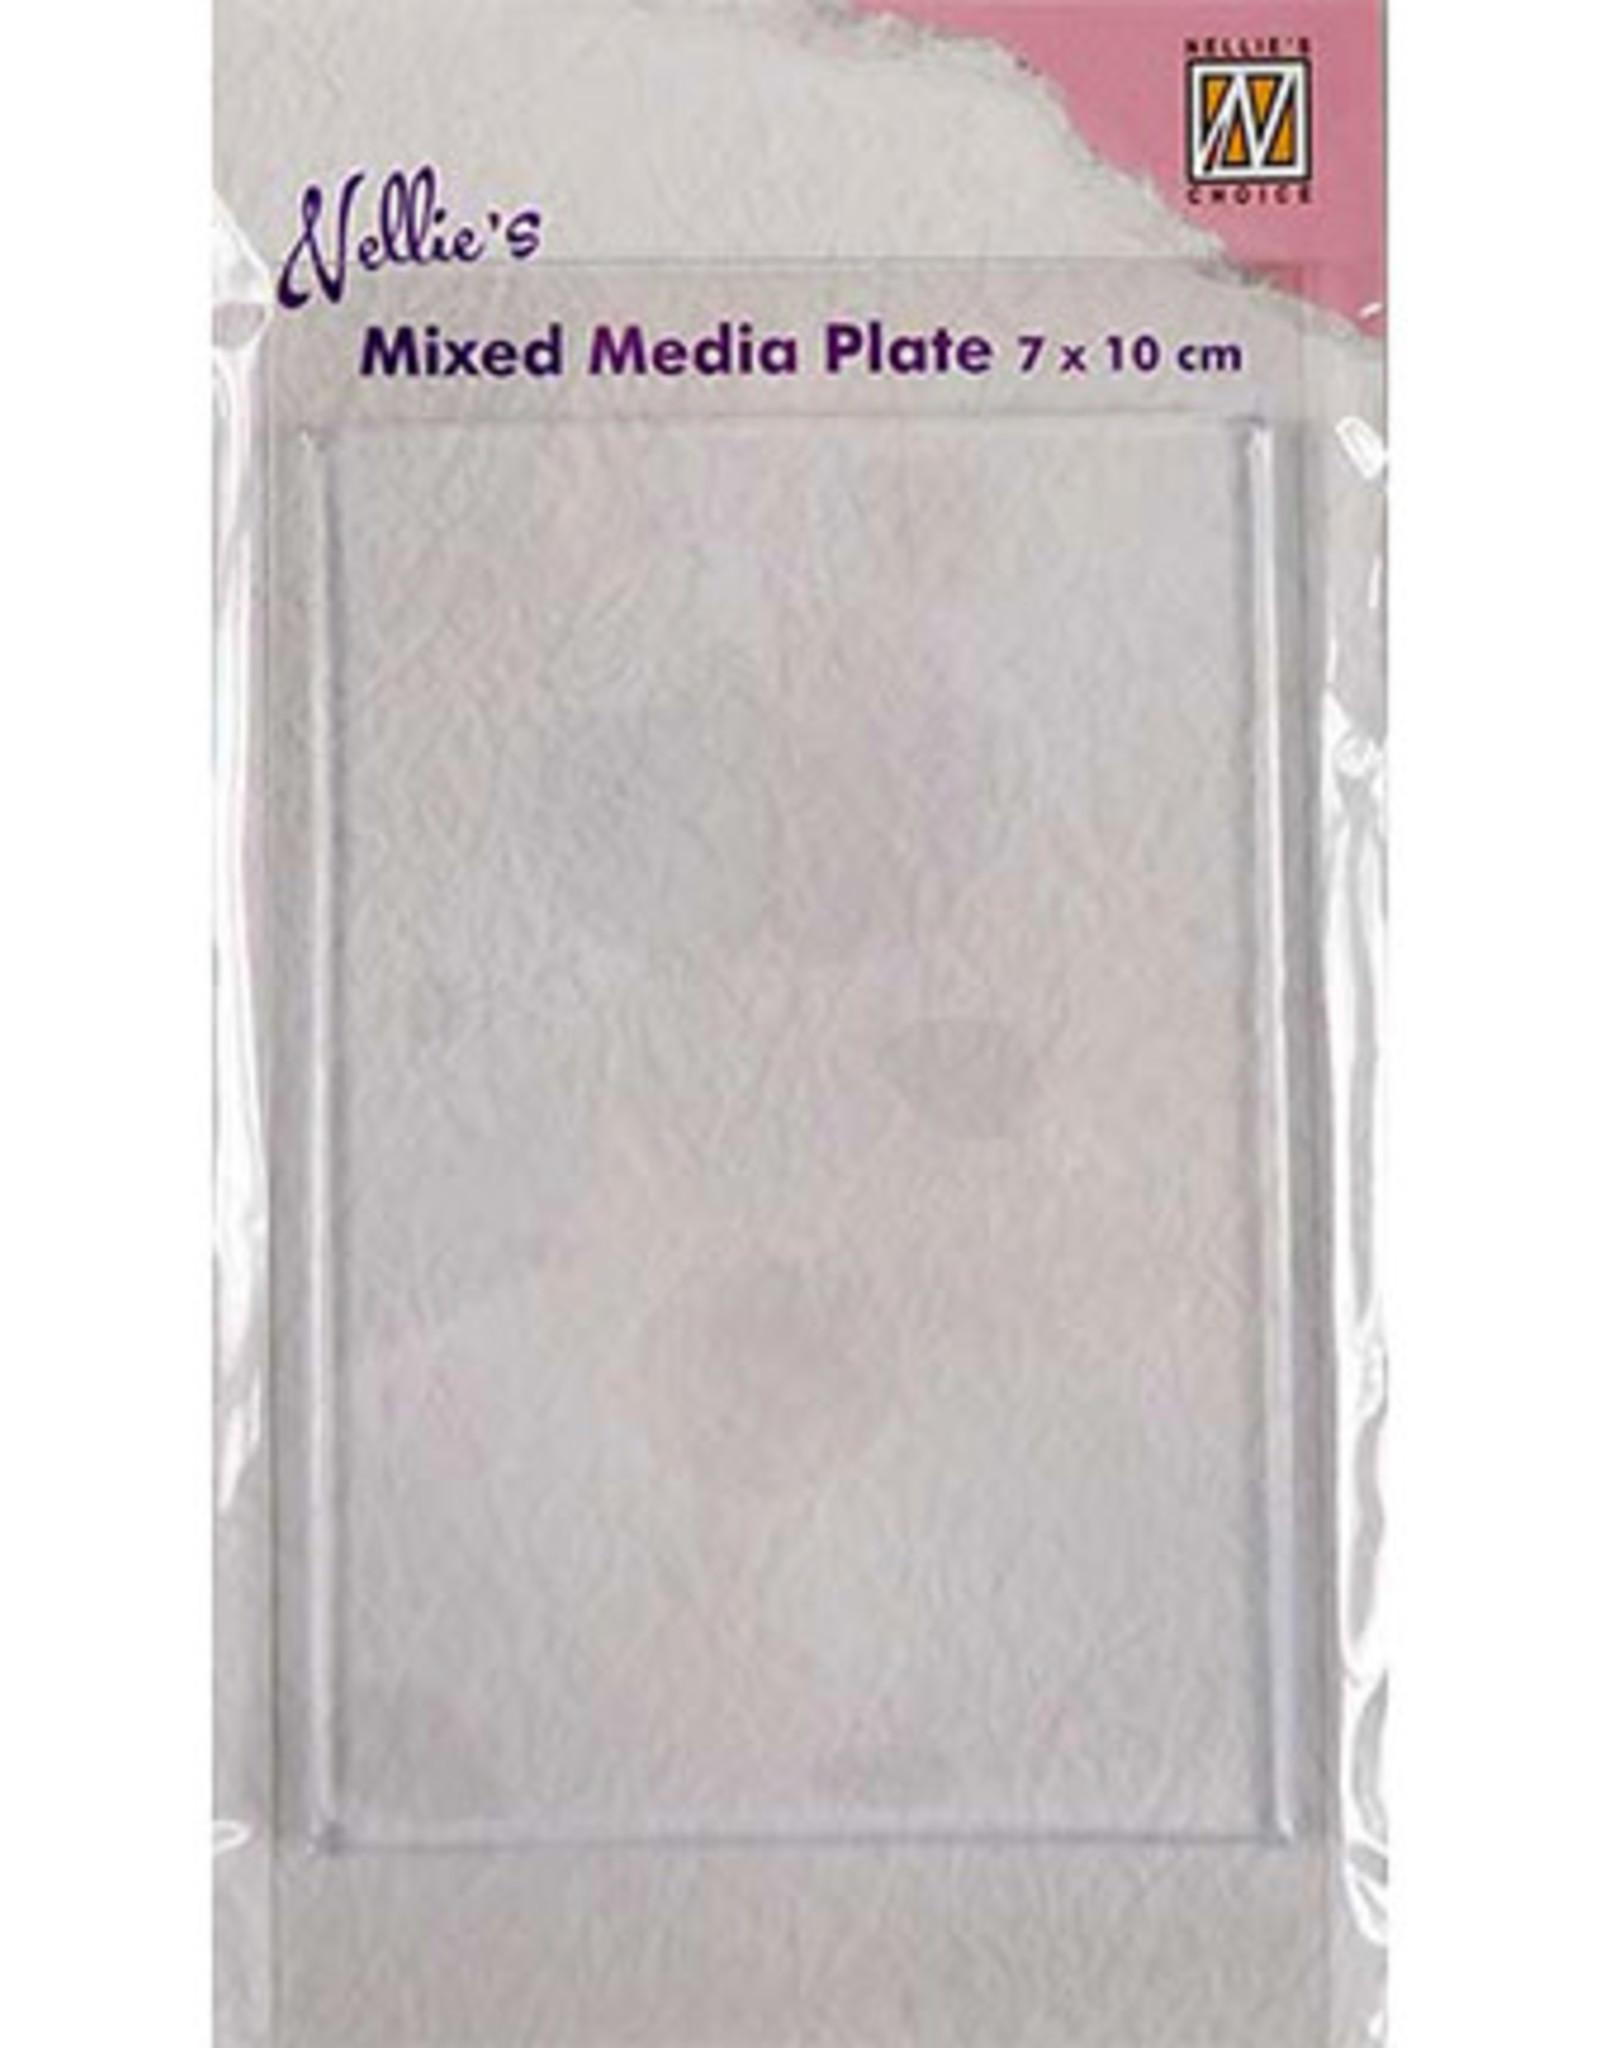 Mixed Media Plate Rechthoek